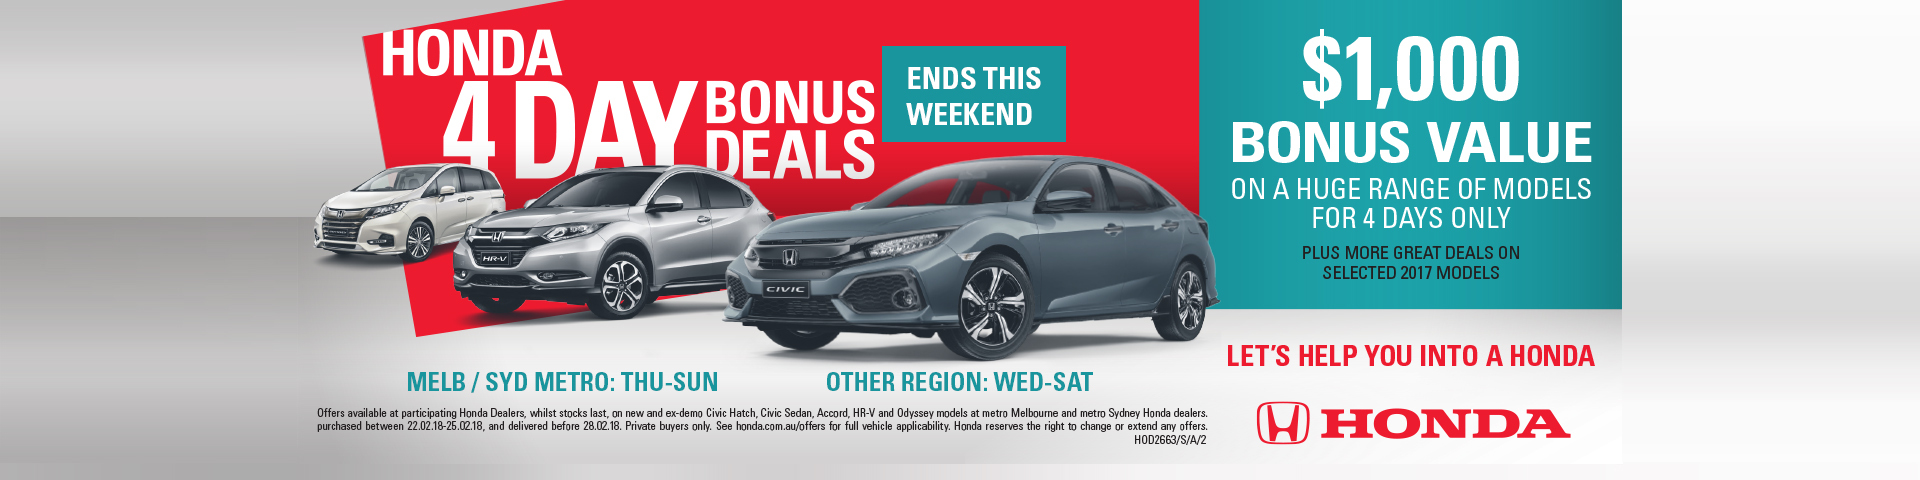 Honda 4 Day Bonus Deals